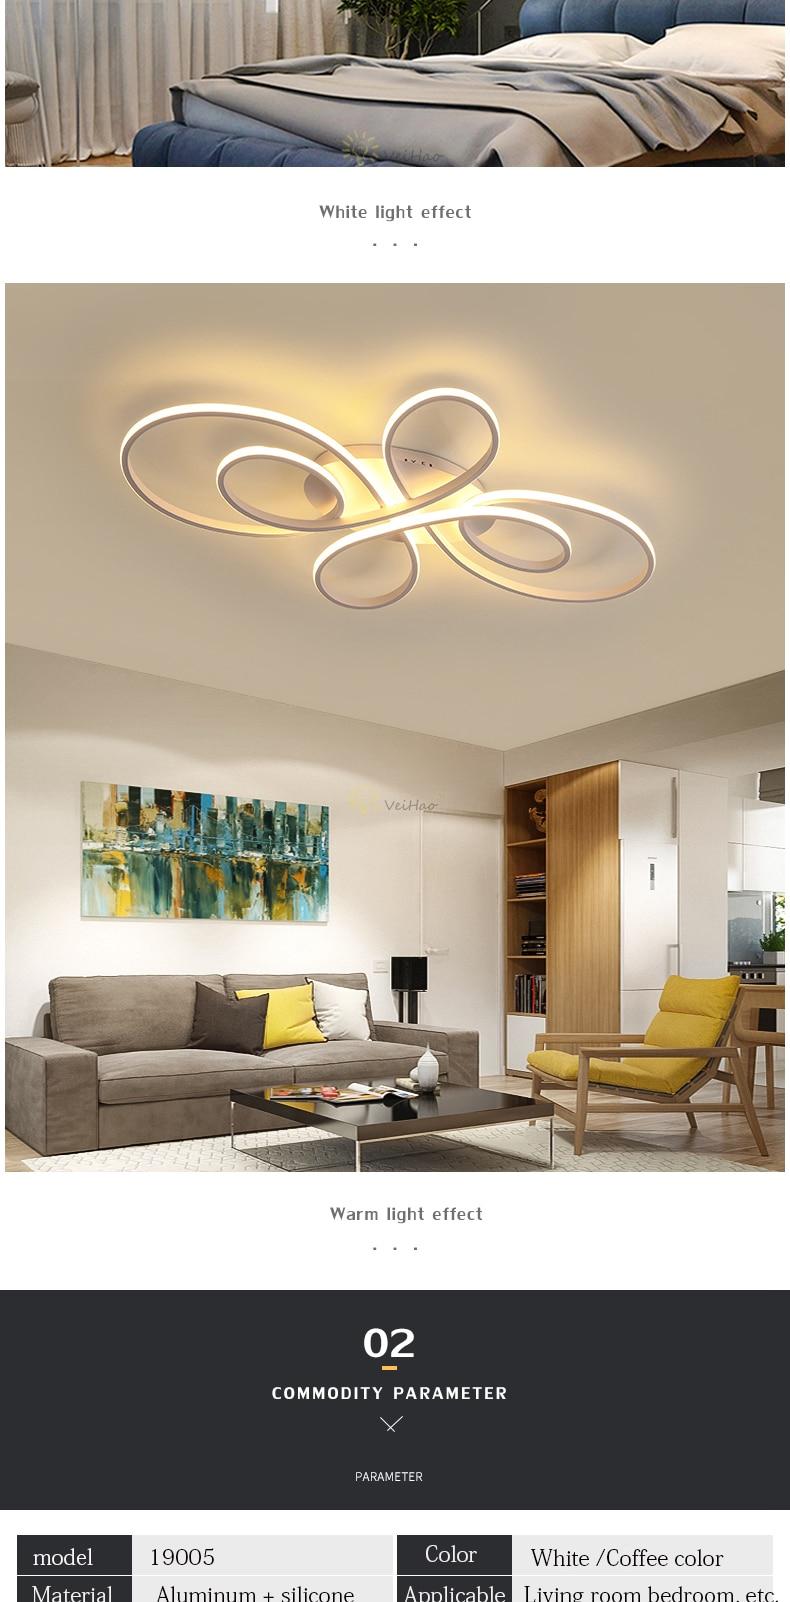 HTB1BSJka8WD3KVjSZFsq6AqkpXaA Modern LED ceiling Lights dimmable living room dining room bedroom study balcony aluminum body home decoration ceiling lamp